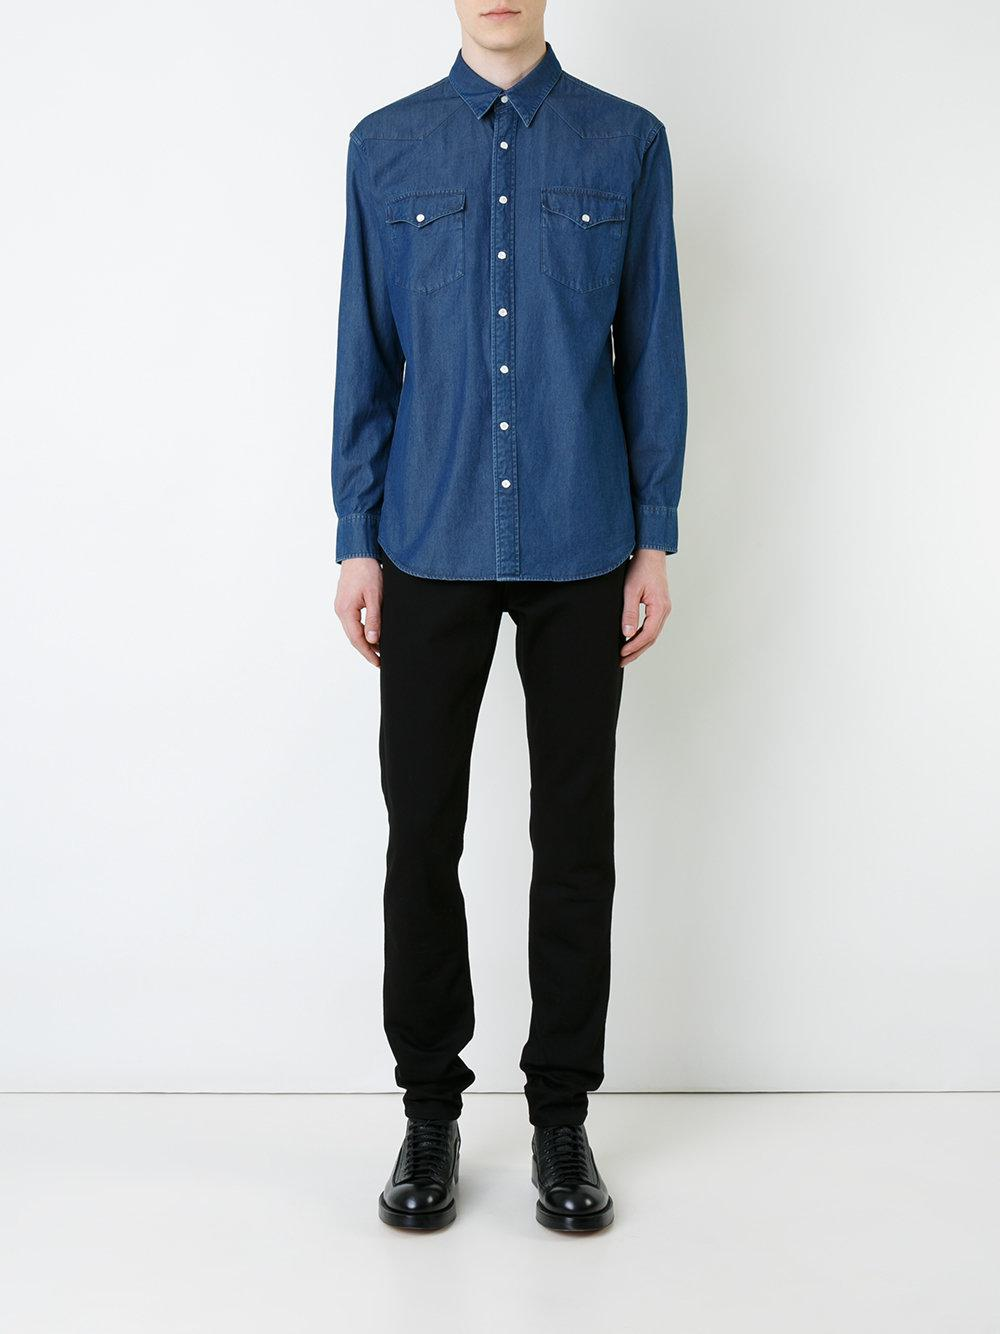 Kent & Curwen Denim Shirt in Blue for Men